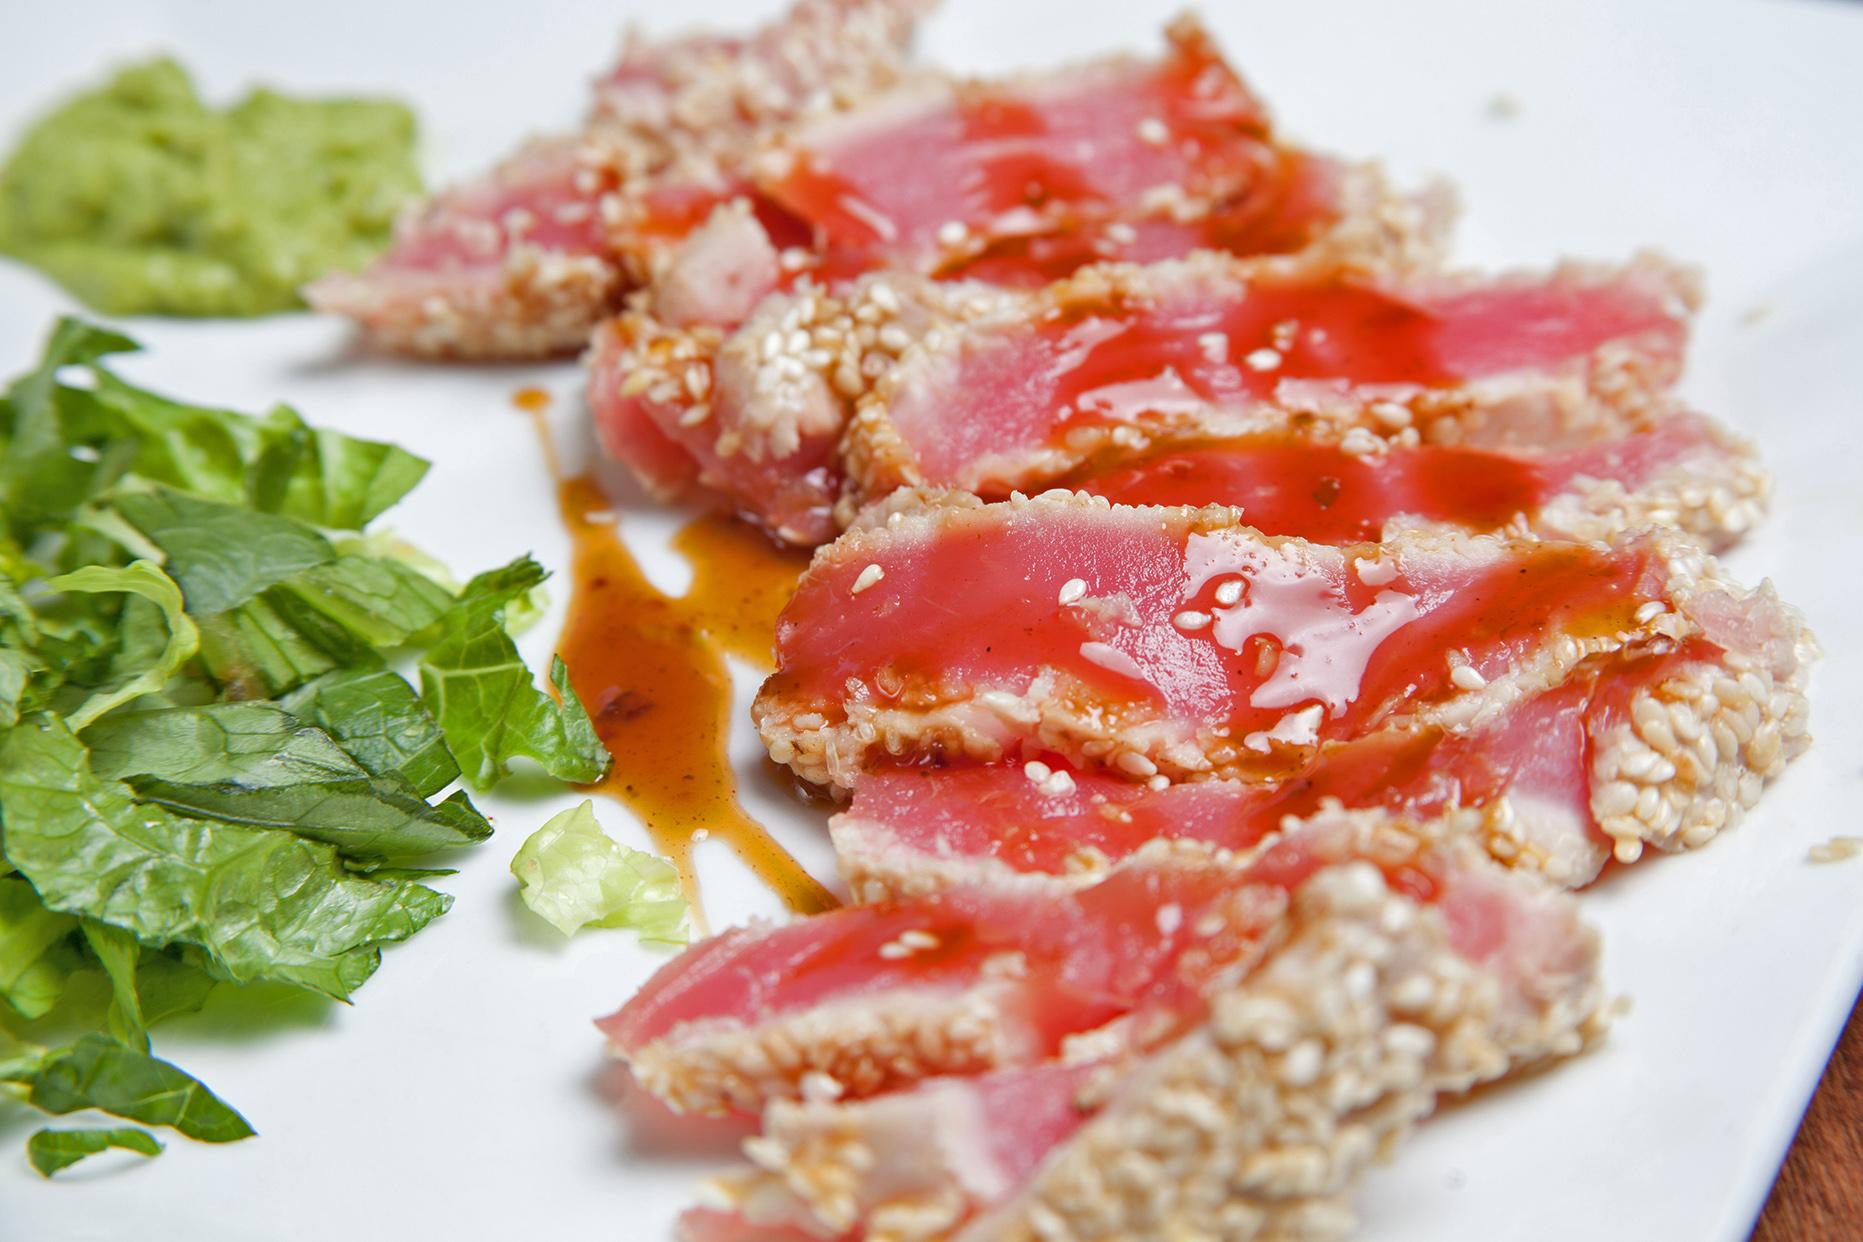 Spiro's Taverna Meat with Sauce